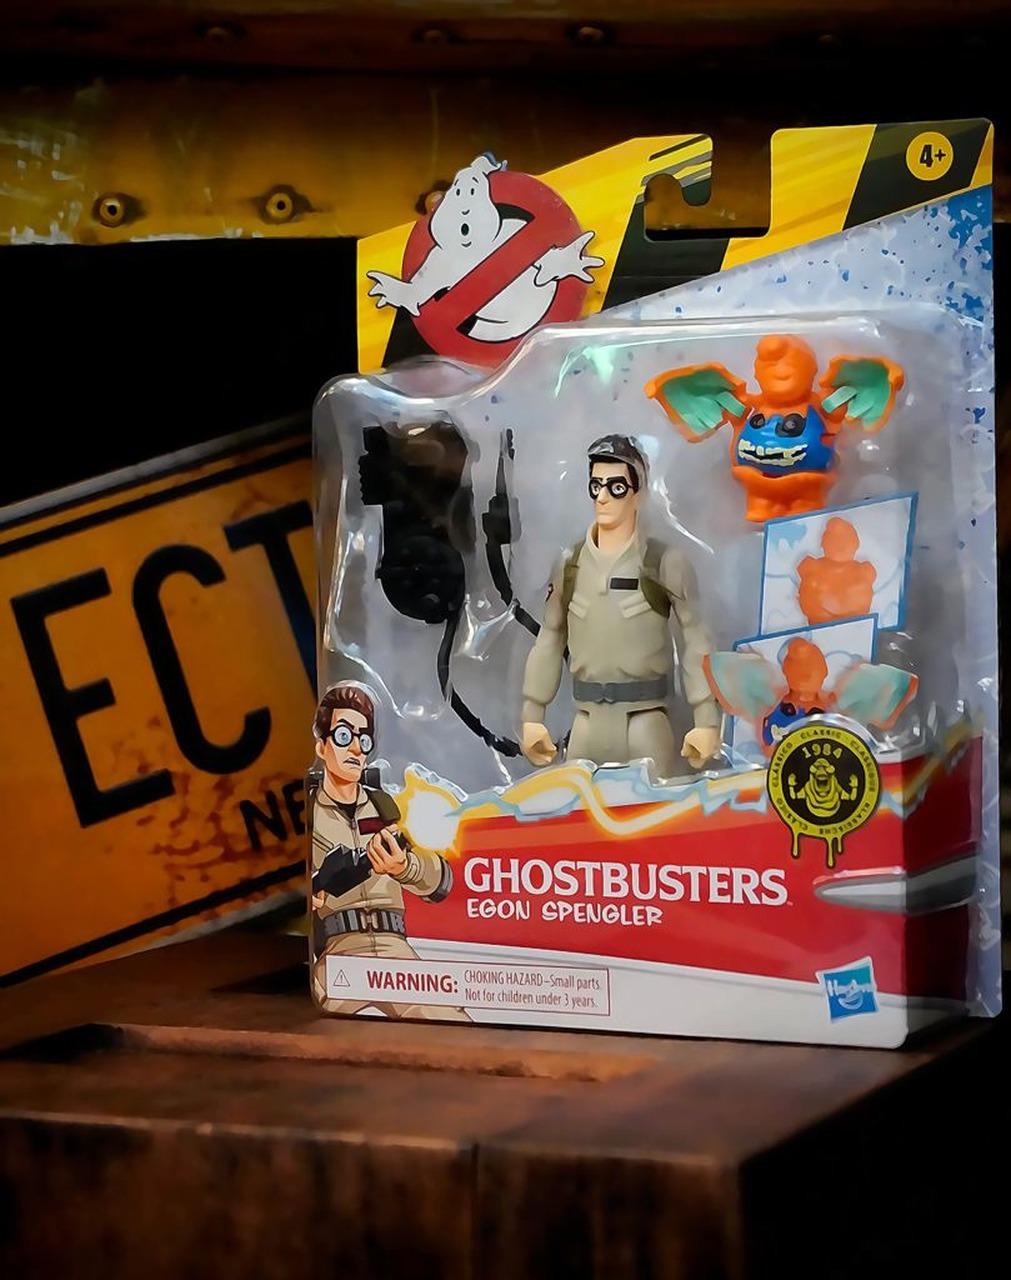 Boneco Action Figure Egon Spengler e Fantasma Laranja Os Caça Fantasmas Ghostbusters E9544 - Hasbro